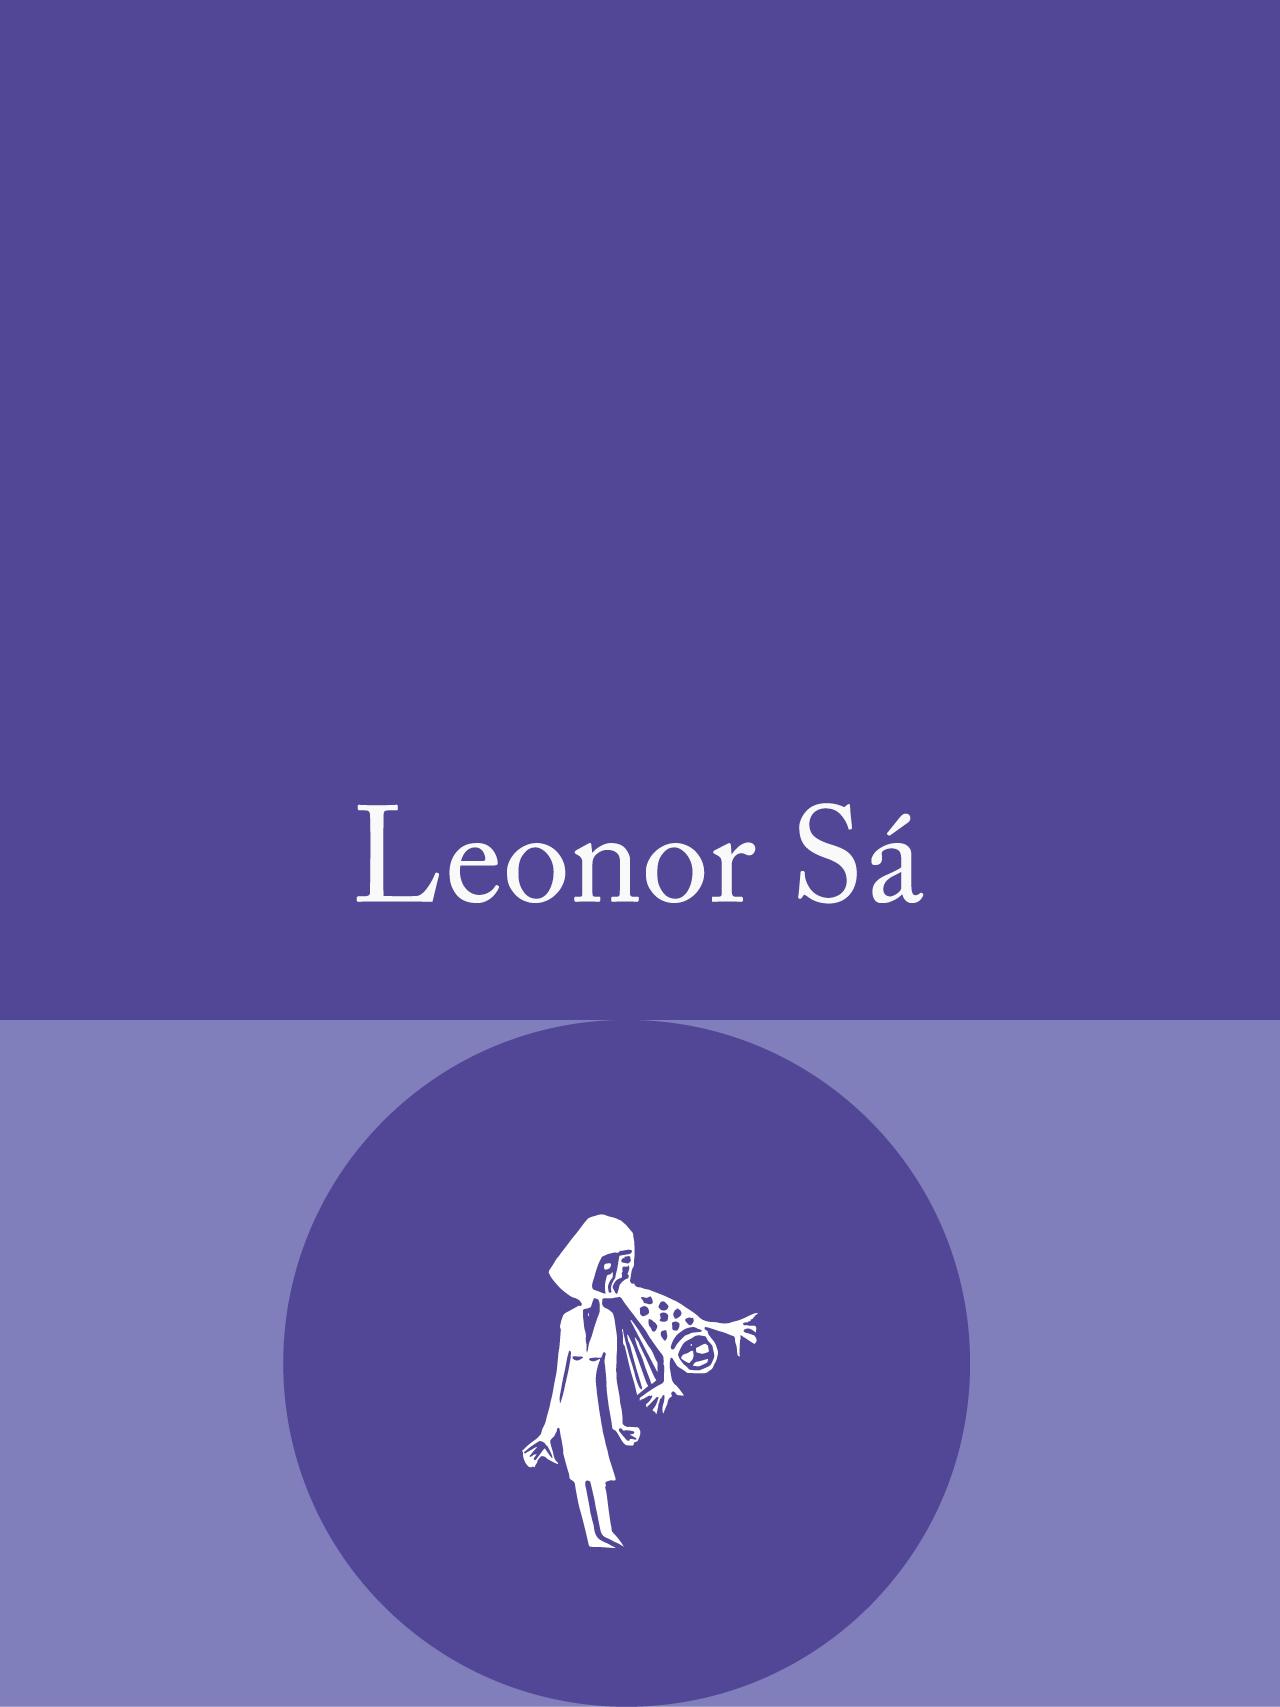 LeonorSa.jpg